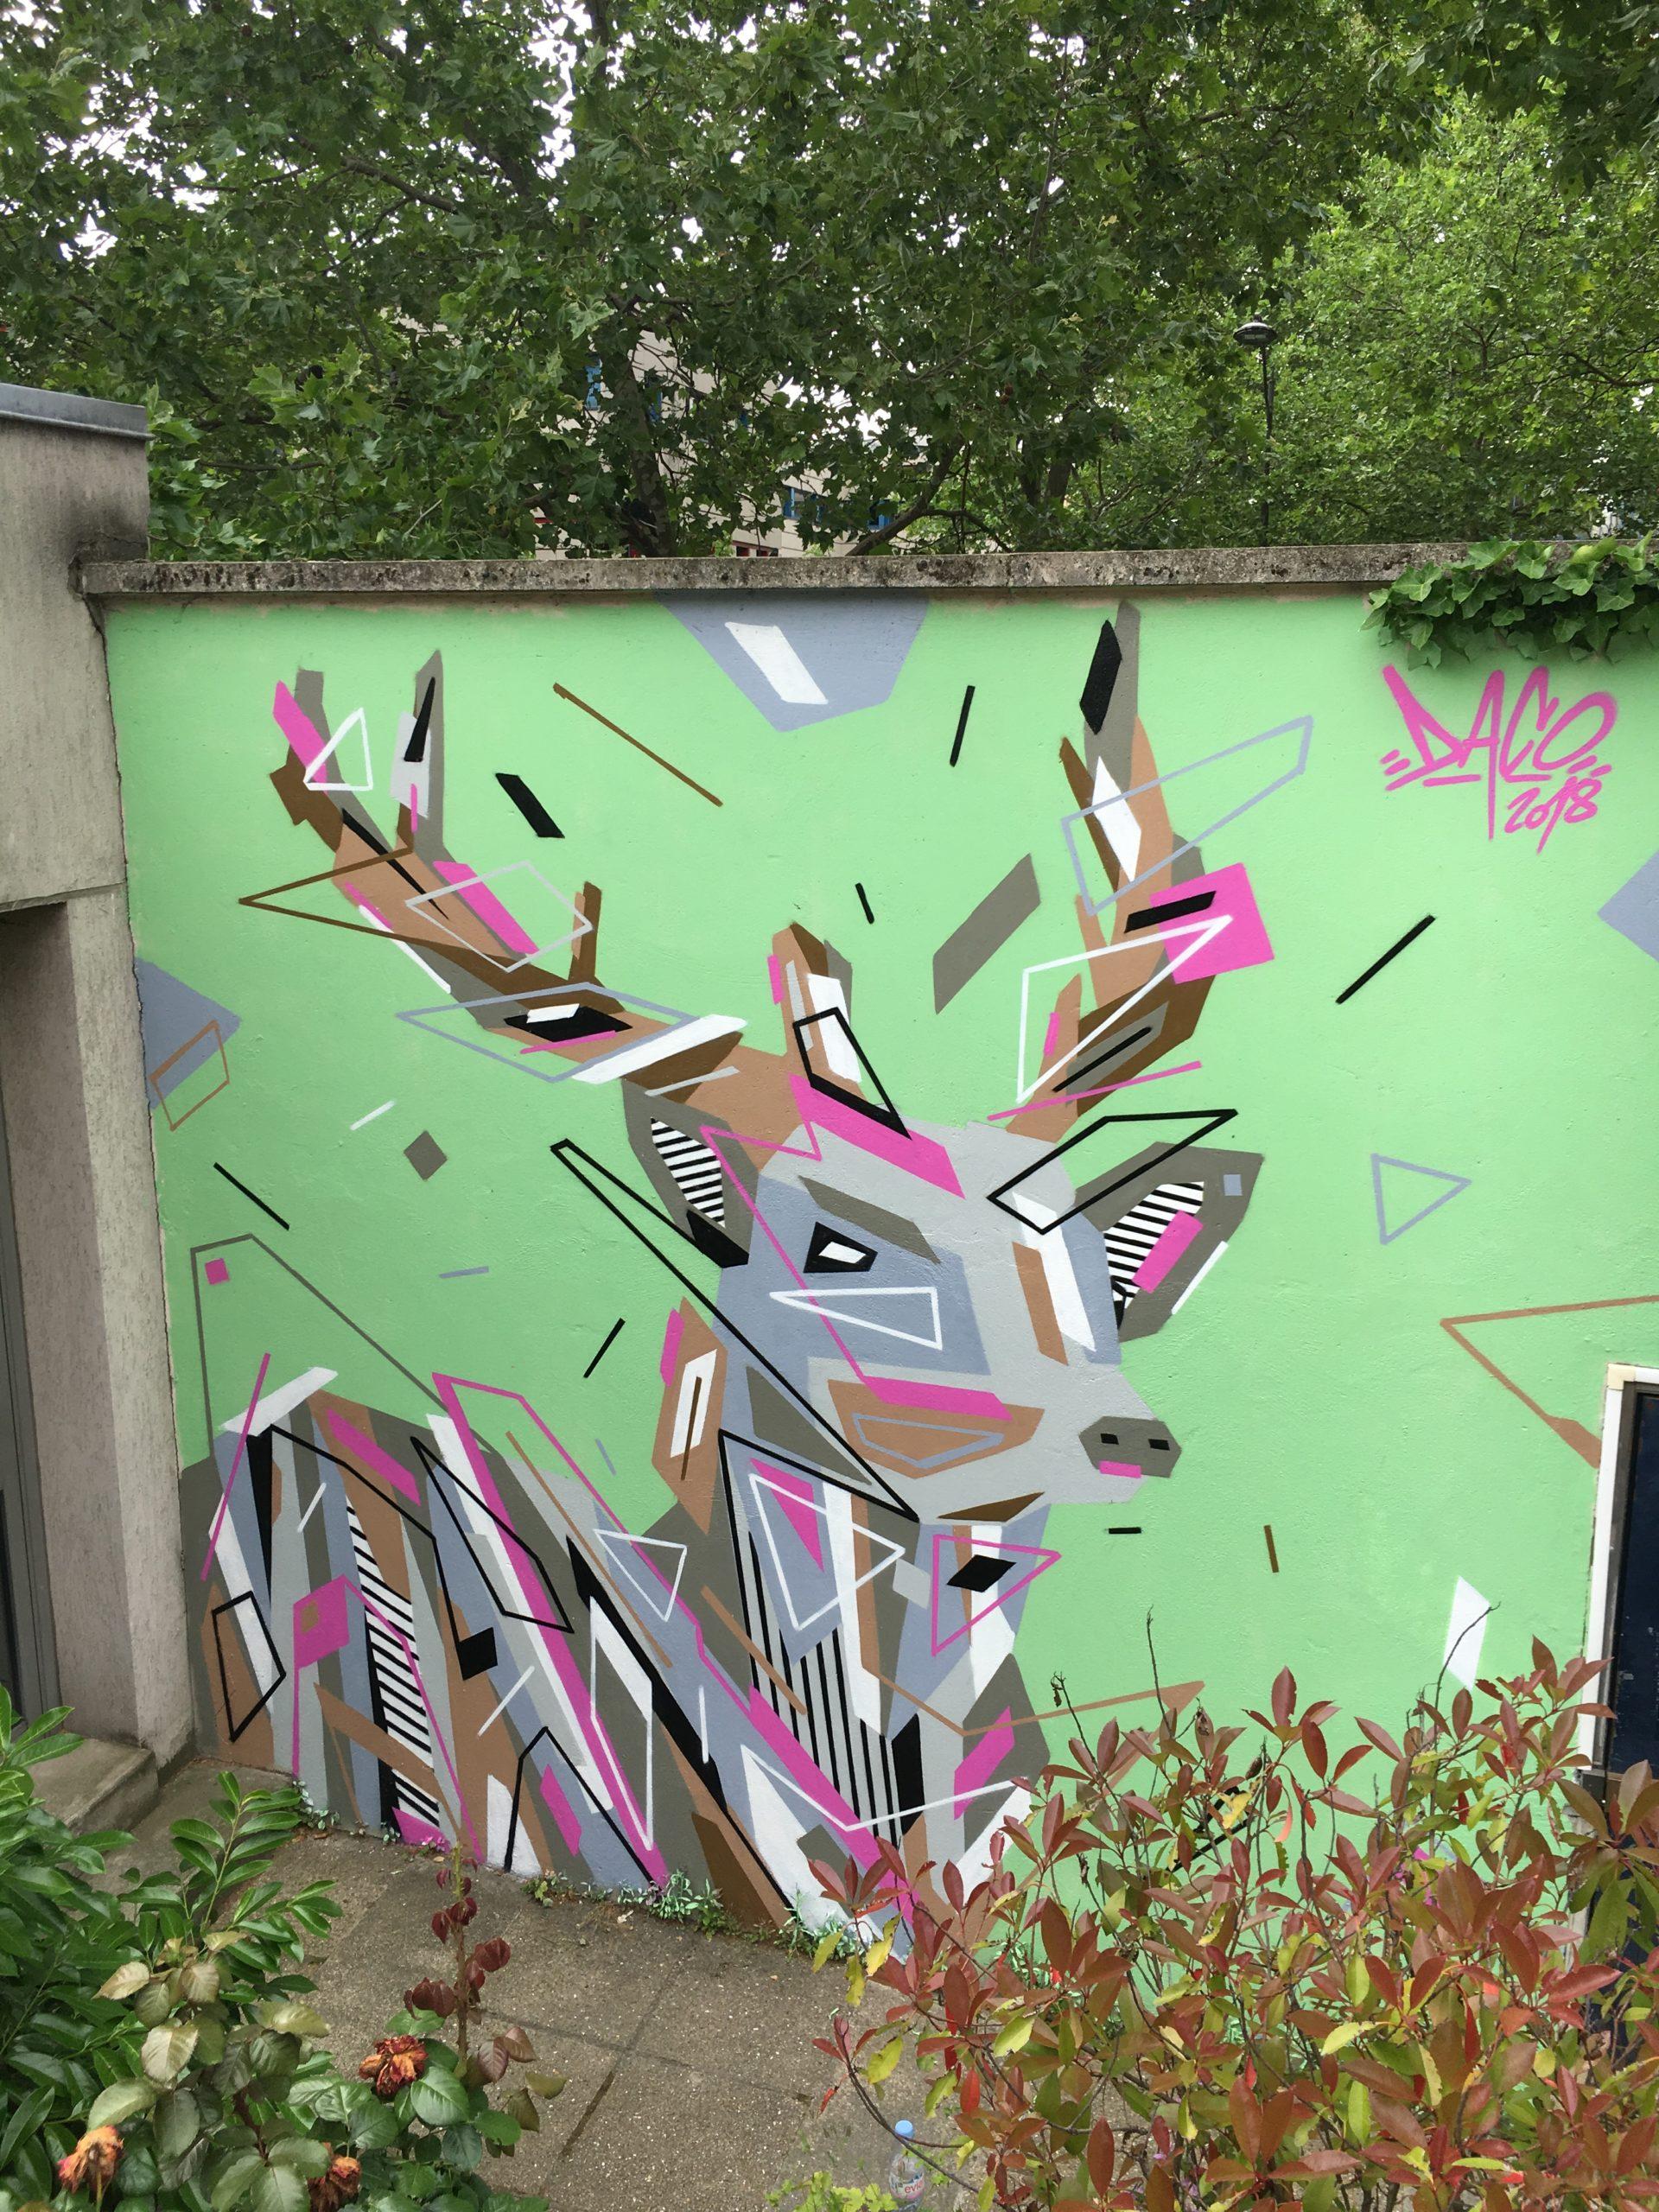 Fresque Graffaune Graffiti faon réalisée par Daco